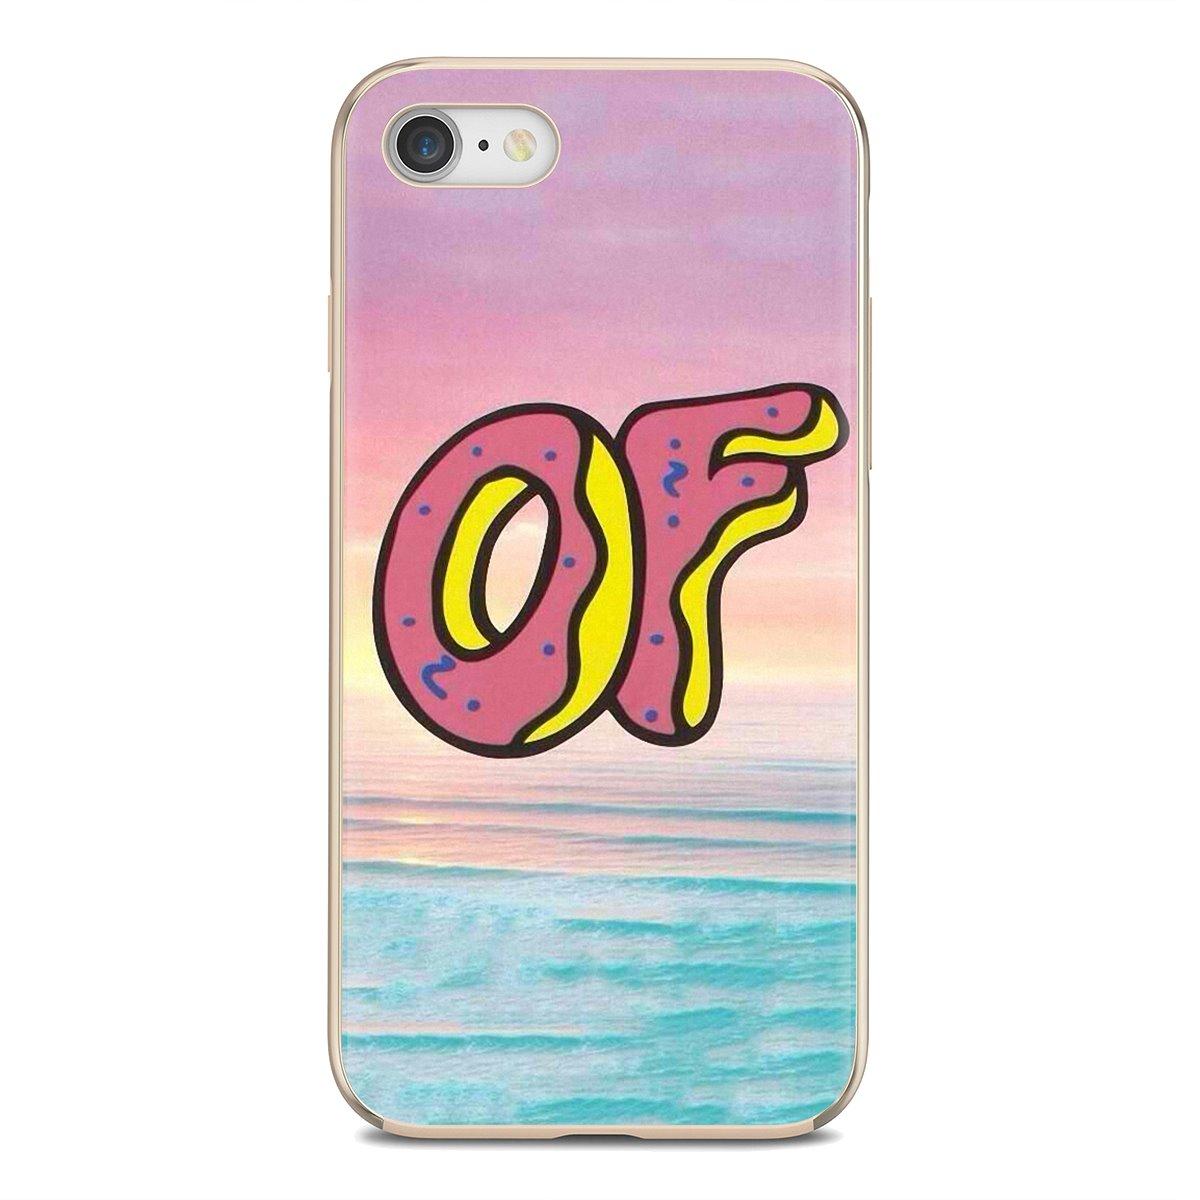 Soft Cover Bag For Samsung Galaxy A3 A5 A7 A9 A8 Star Lite A6 Plus 2018 2015 2016 2017 Ofwgkta Odd Future OF Golf Wang